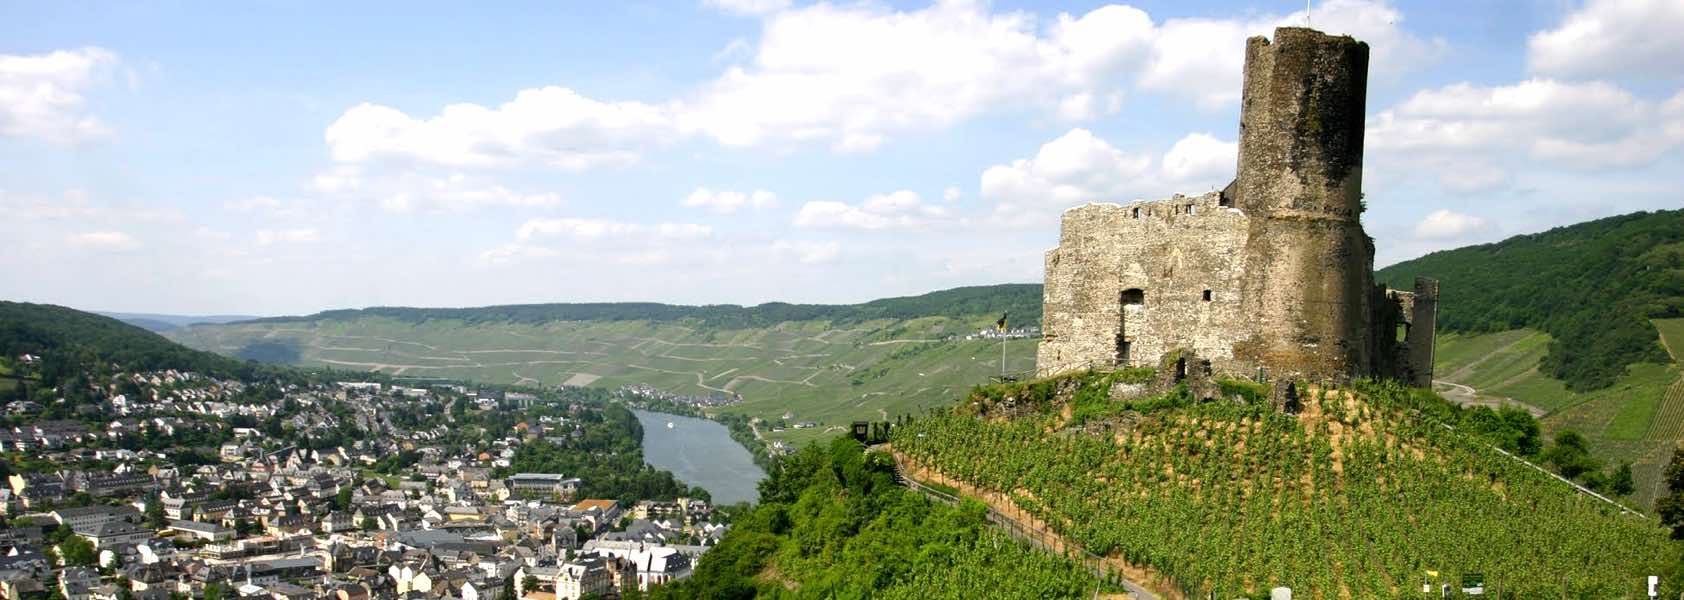 Duitsland | Wandelen in de Eifel over de Matthiasweg